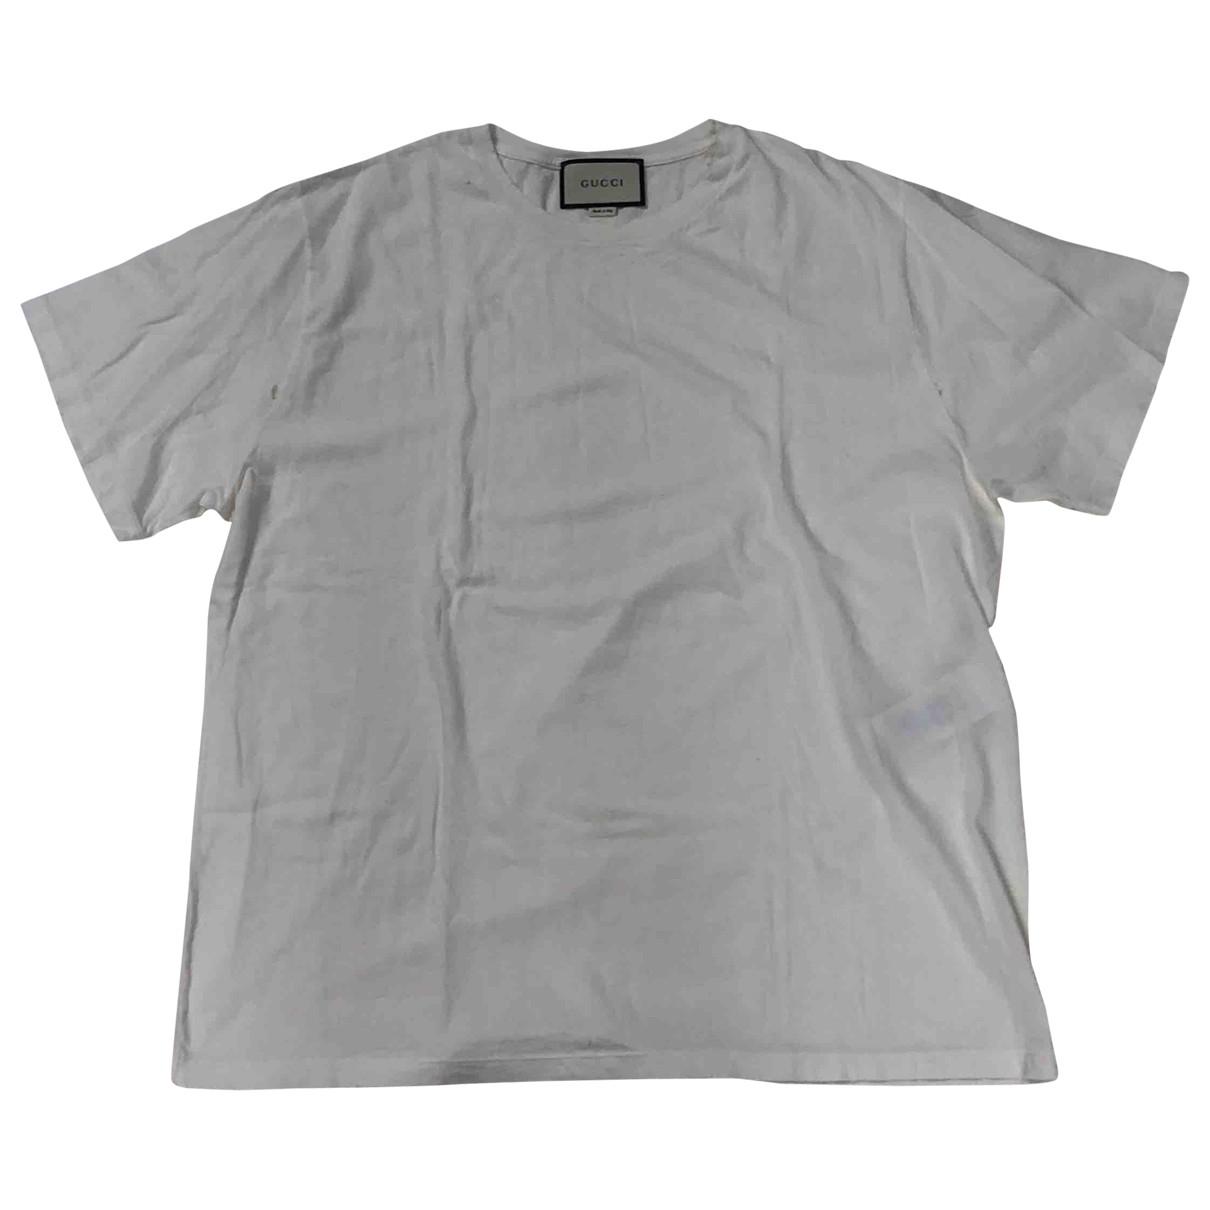 Gucci \N White Cotton T-shirts for Men M International